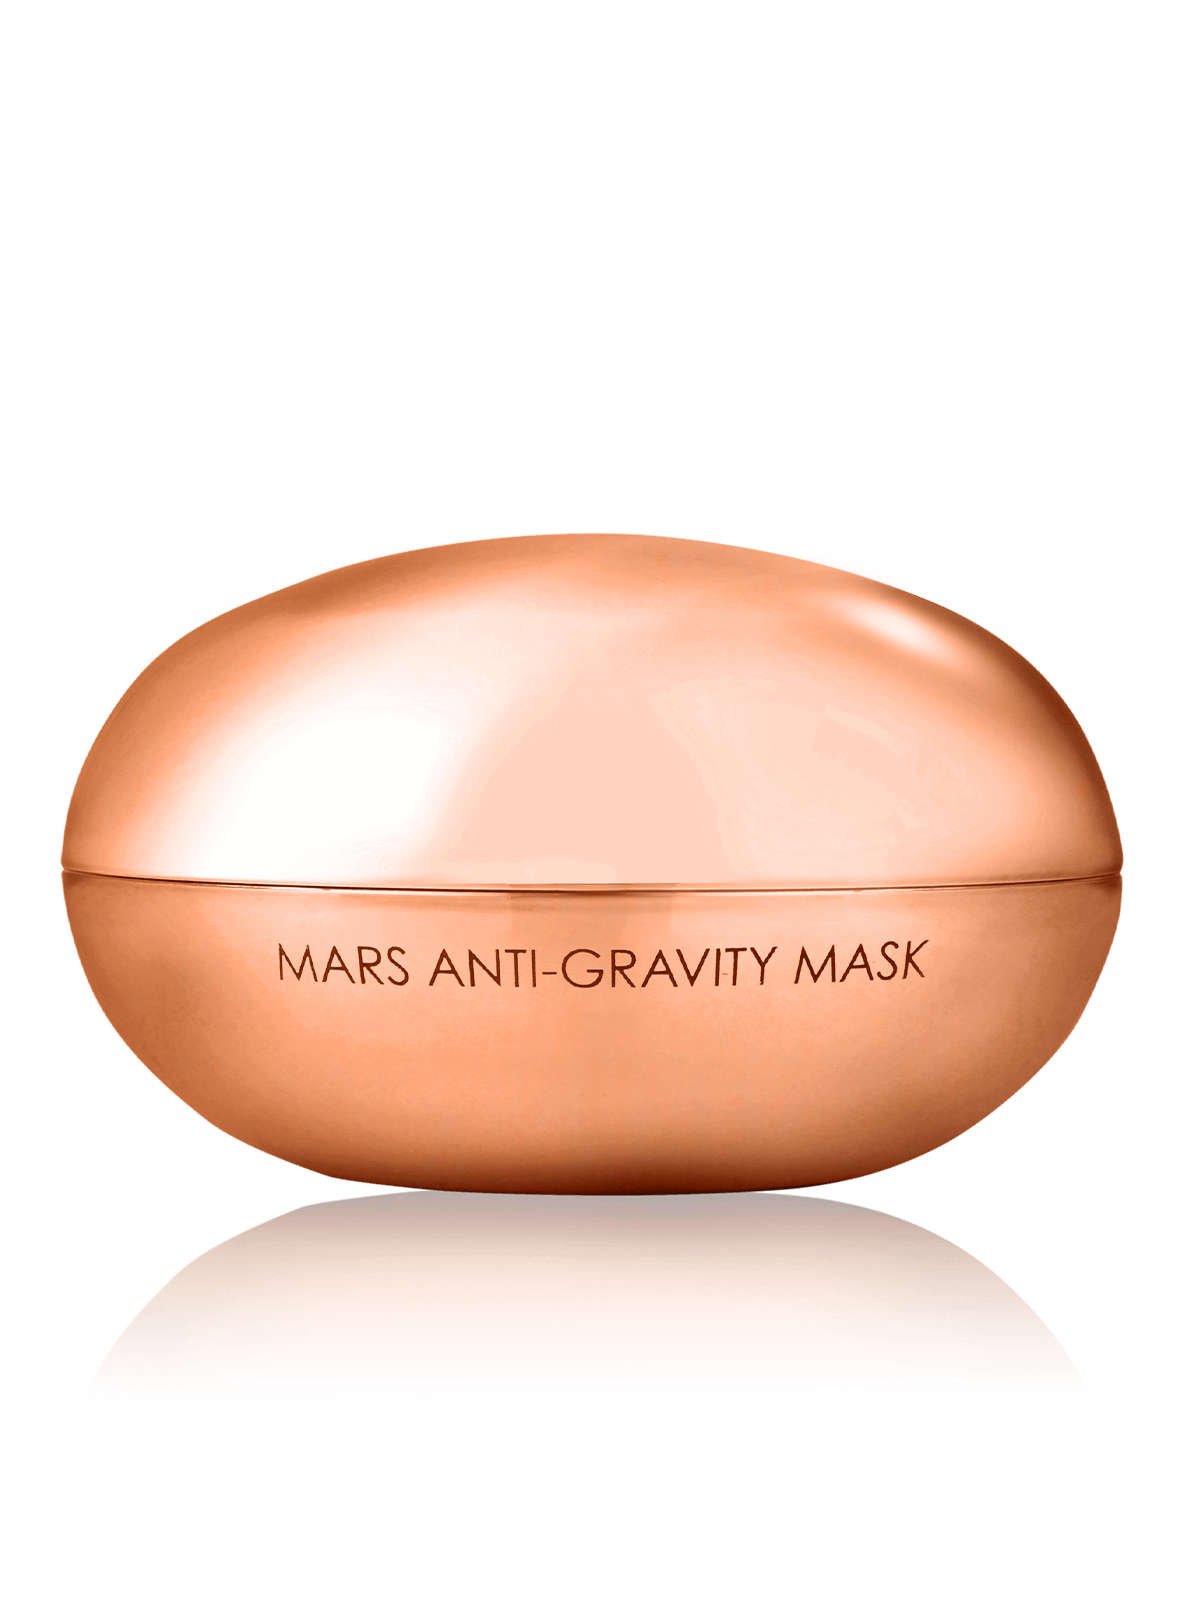 Mars Anti-Gravity Mask back